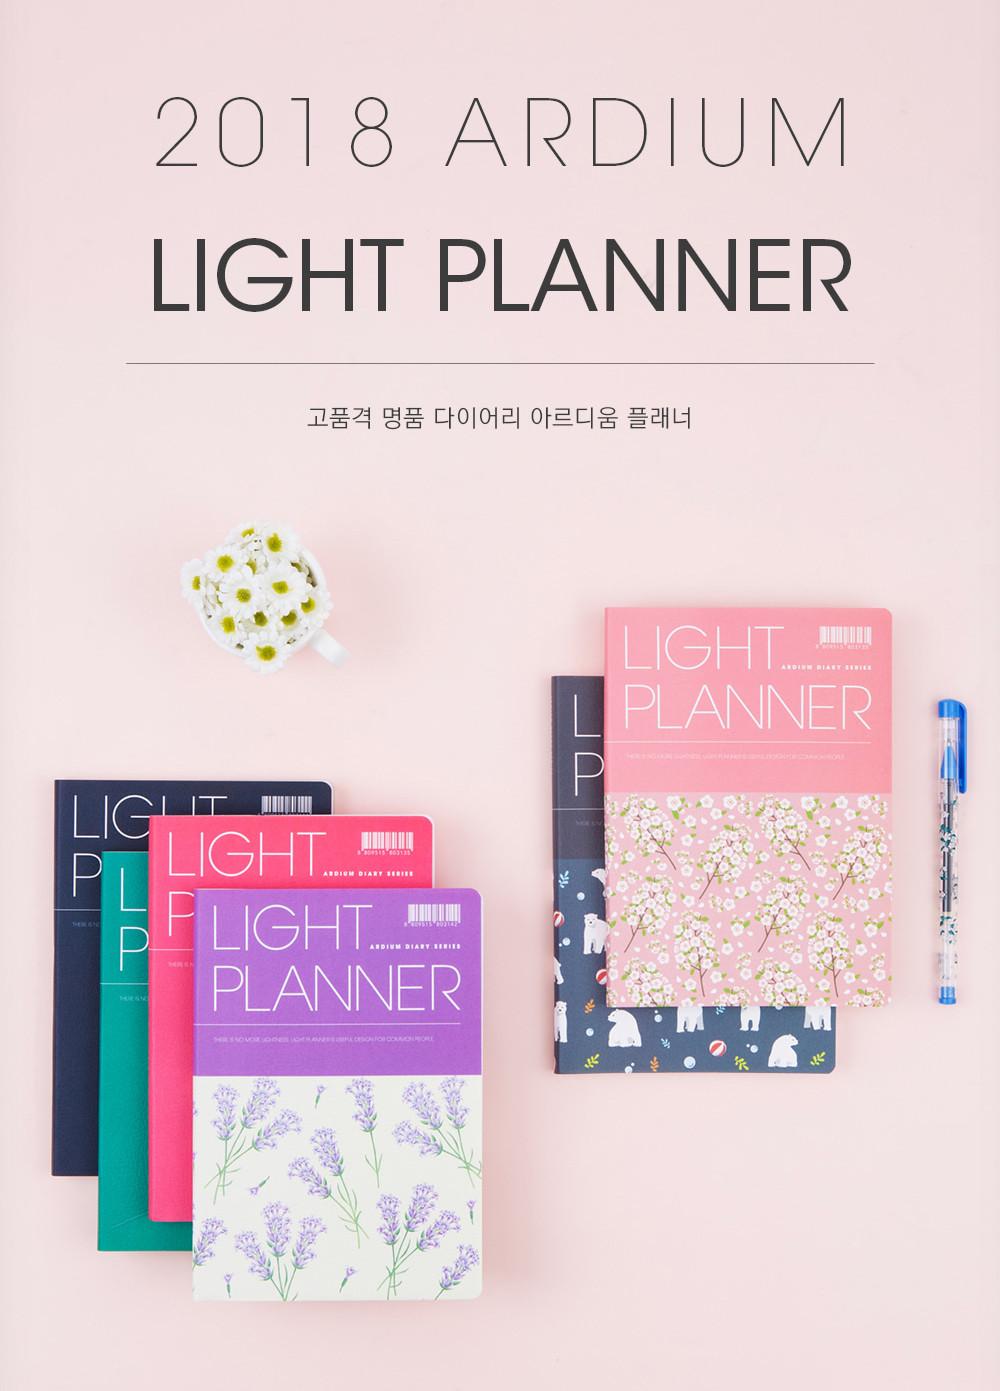 2018 Ardium Light Planner